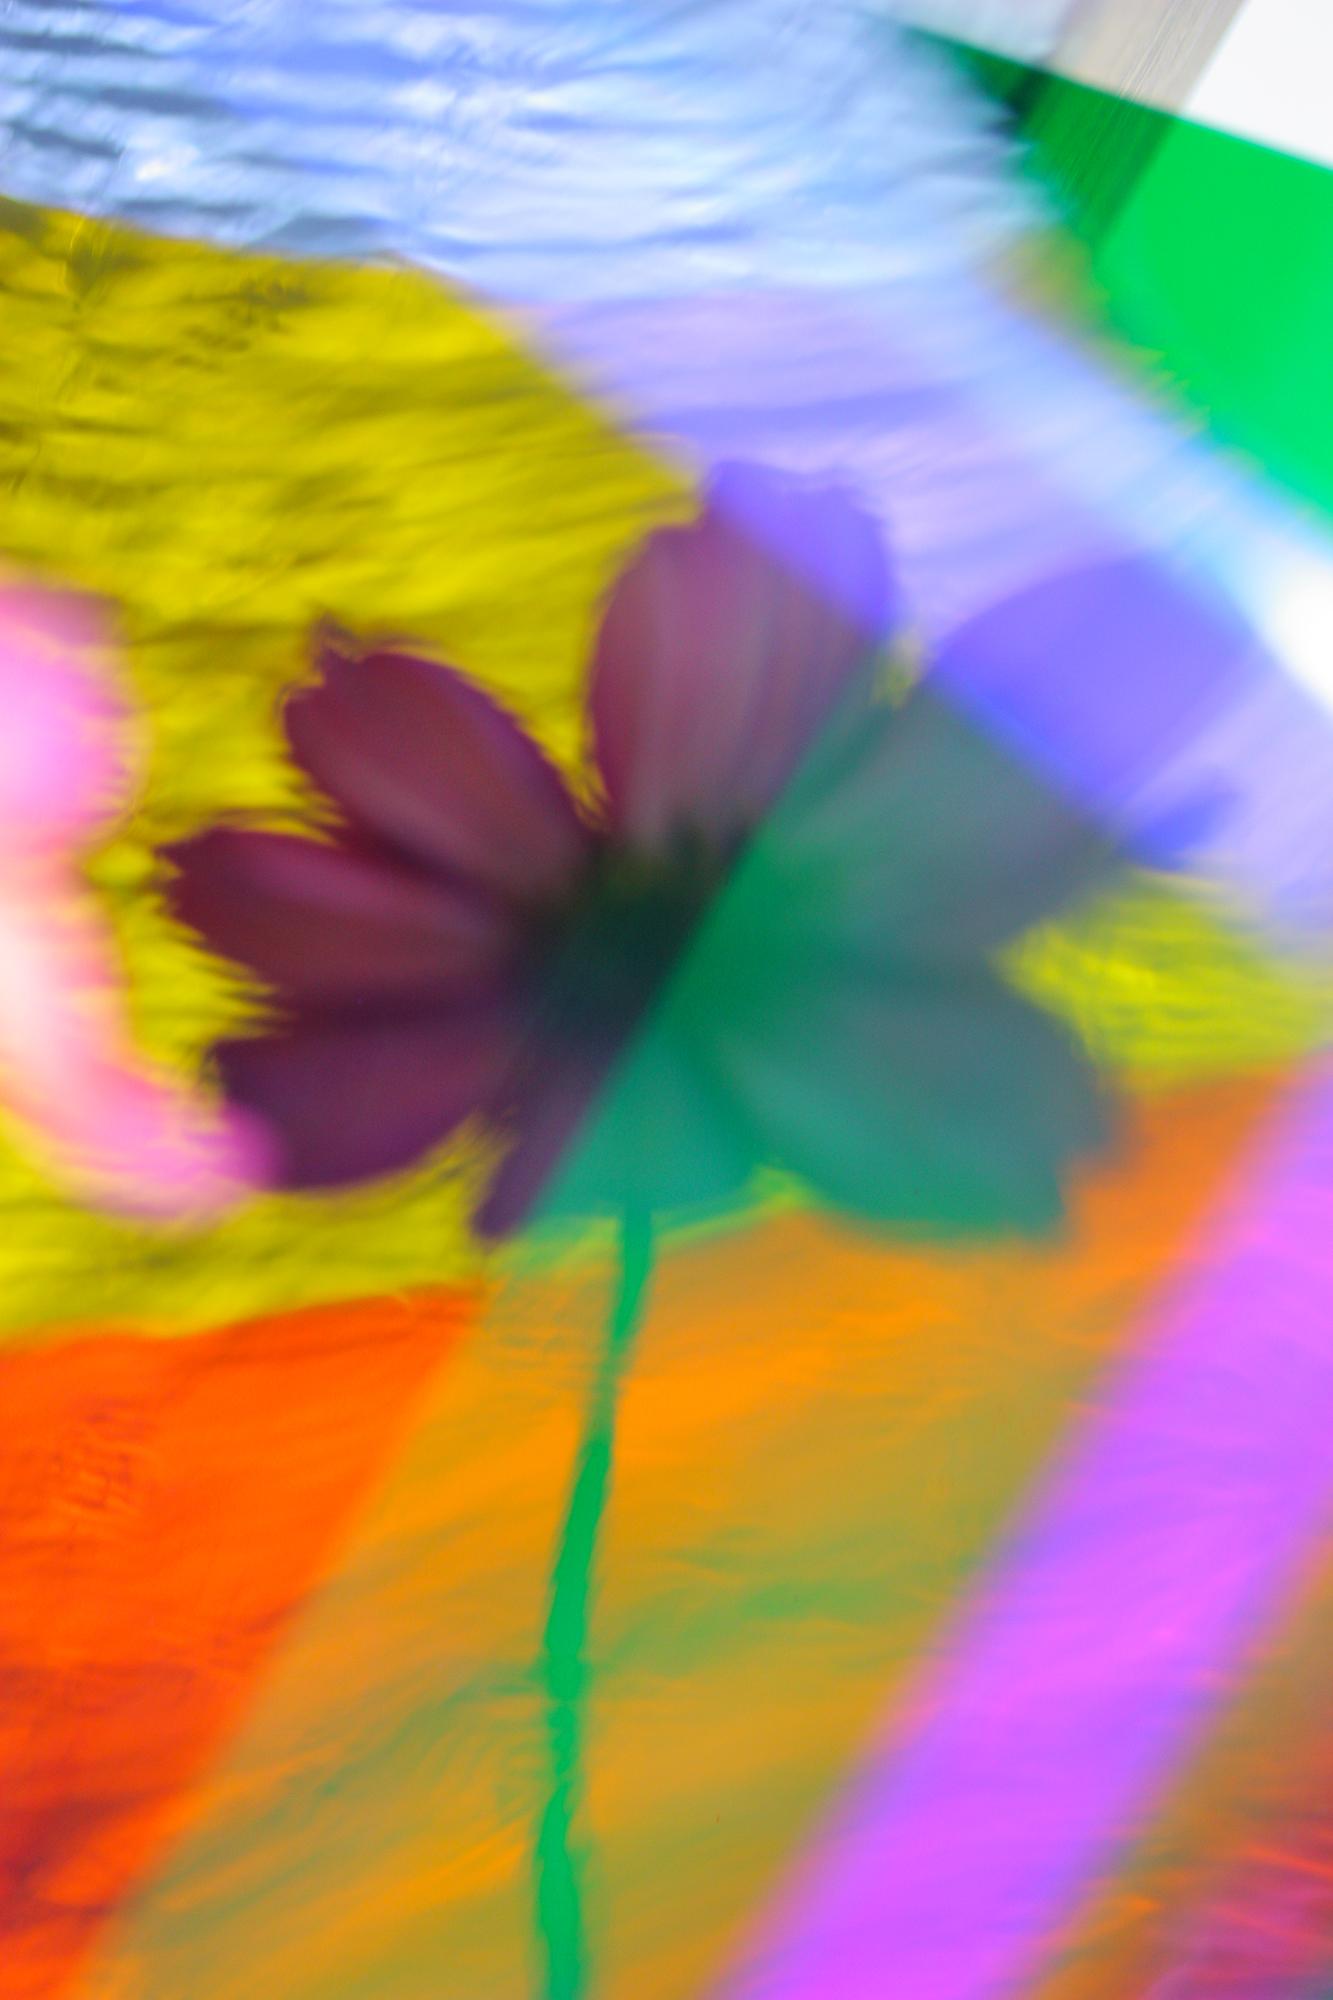 © David Garland | Refracted Flowers